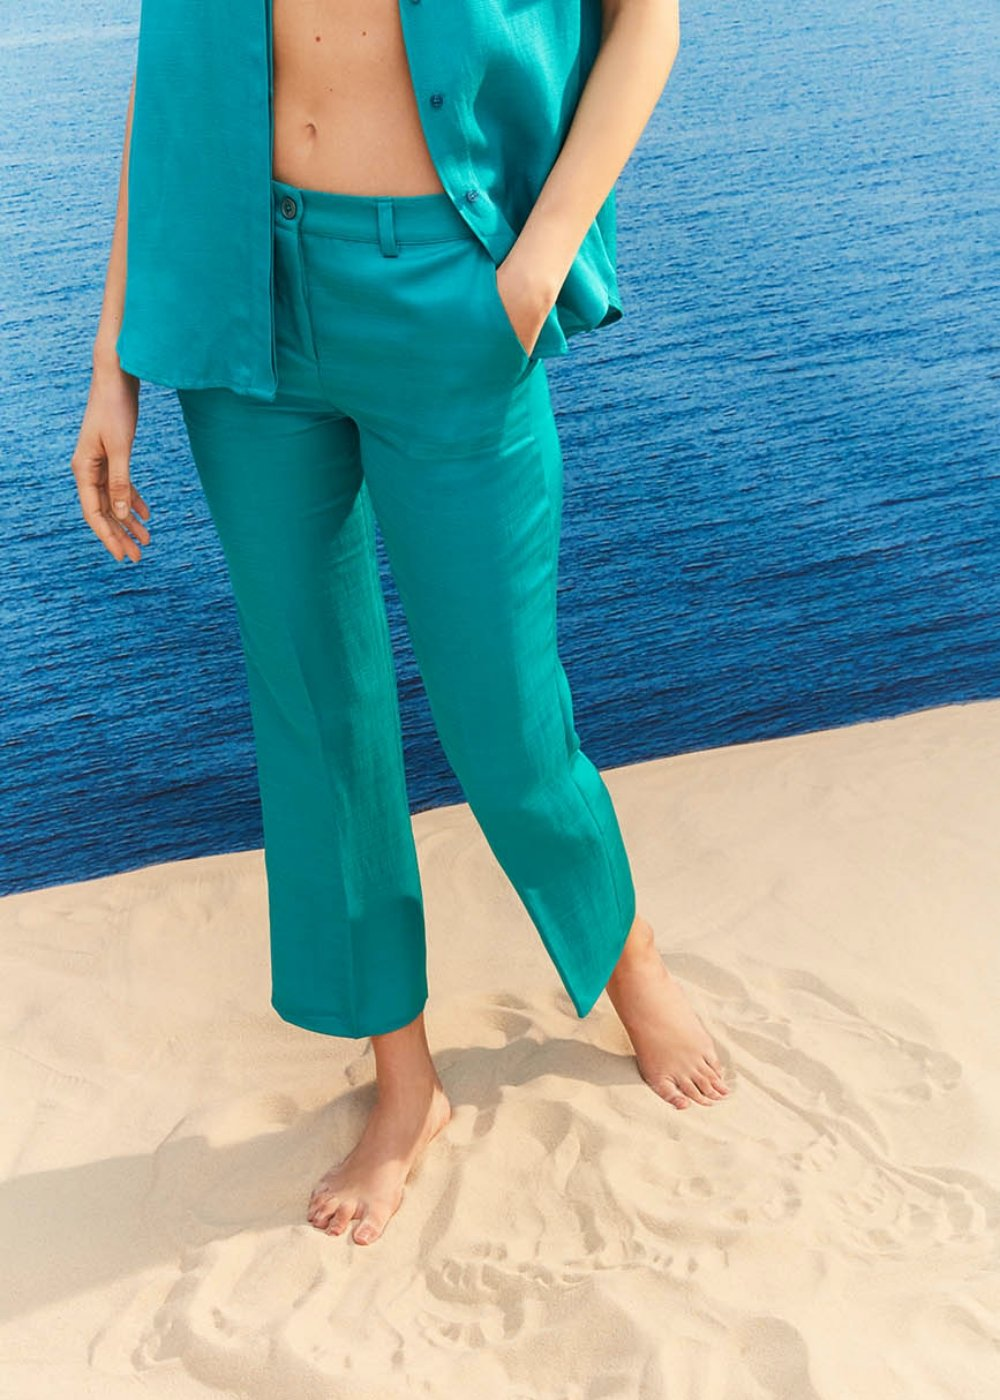 Jacquelib linen blend trousers - Water Blue - Woman